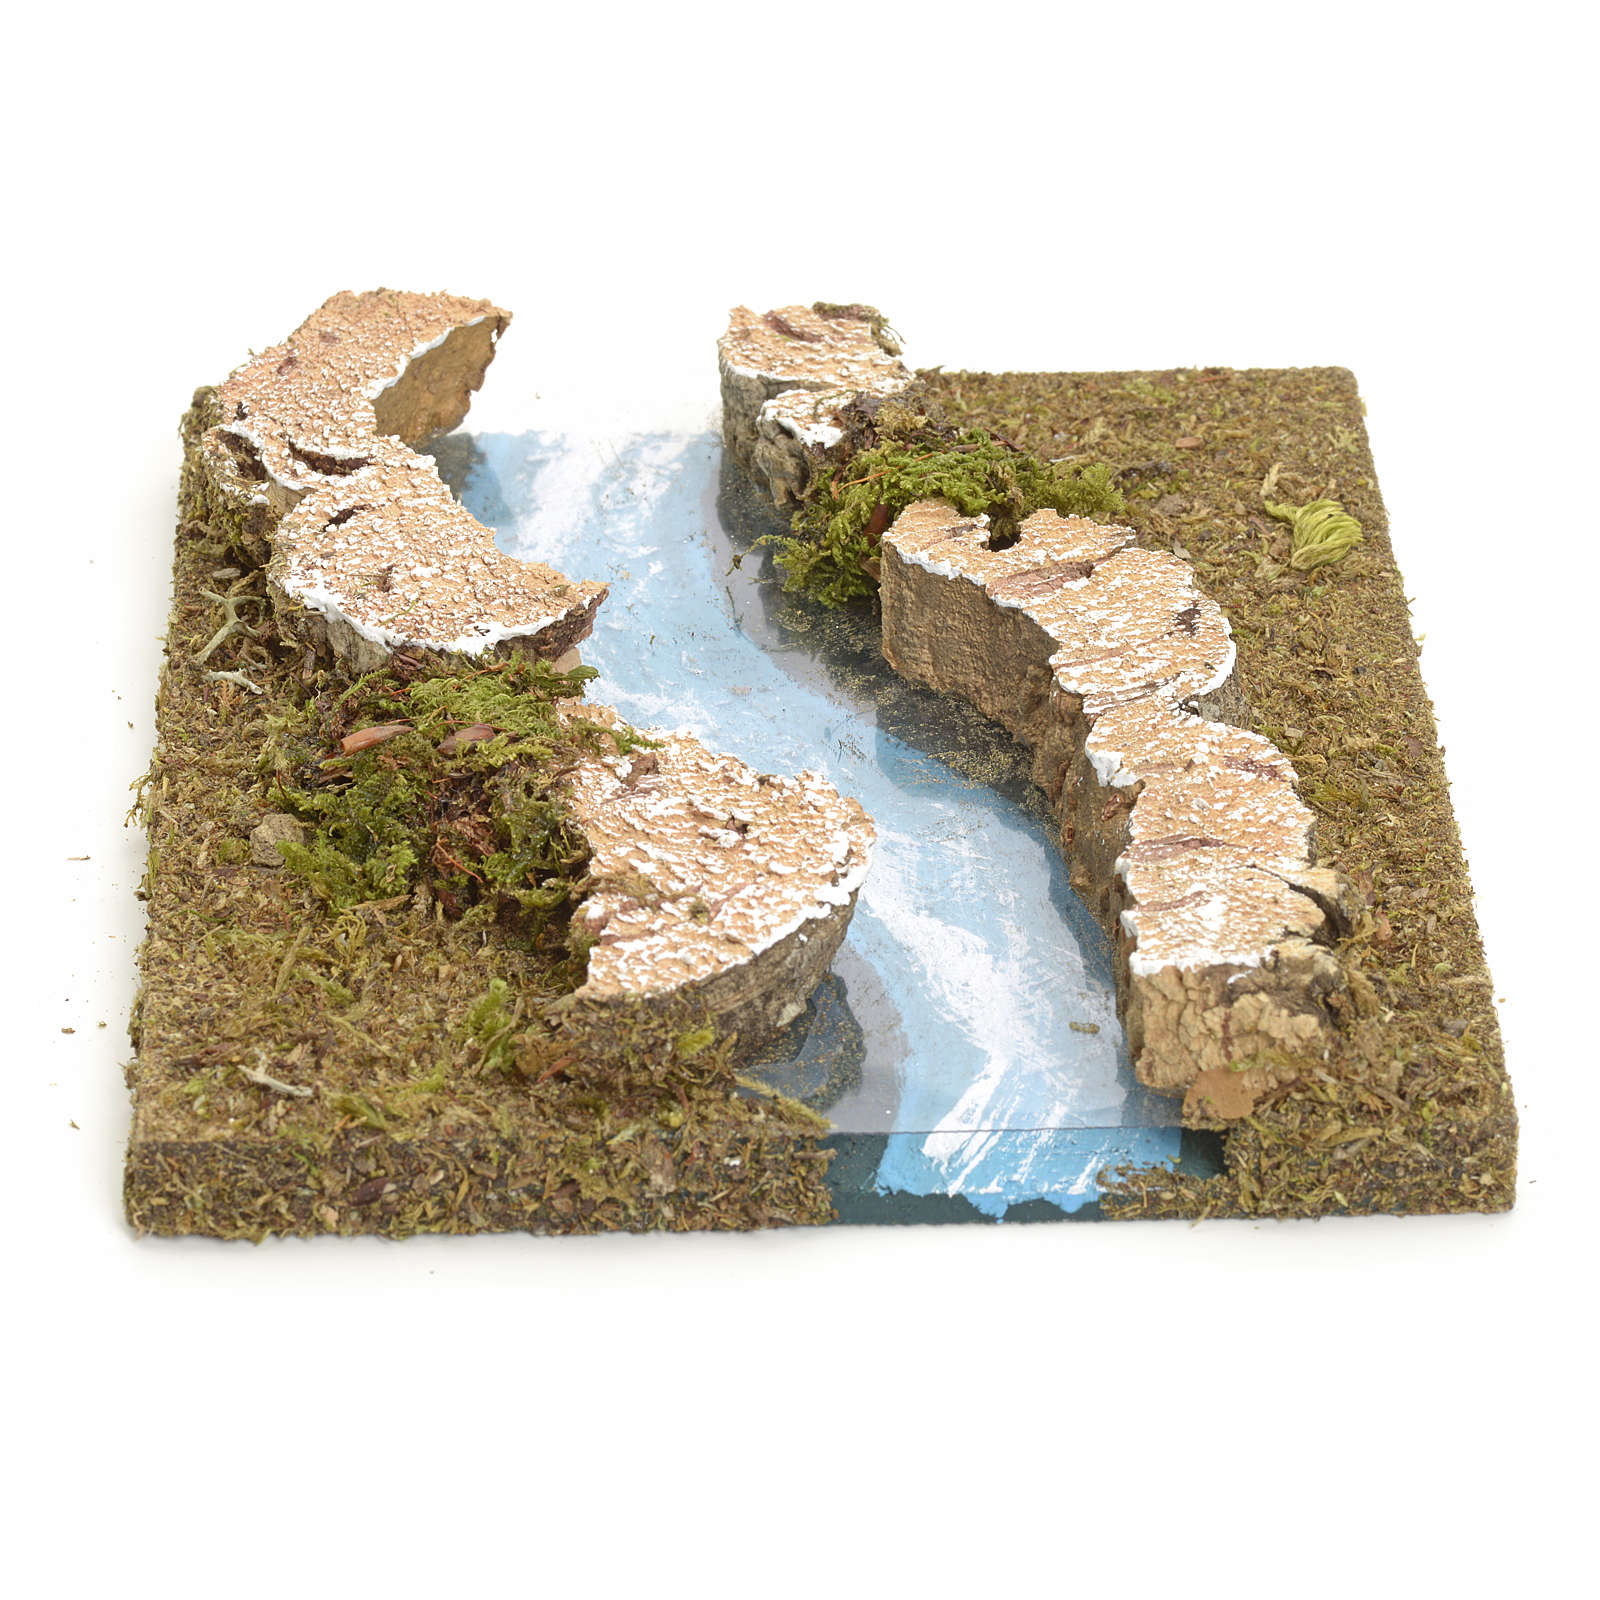 Rio componível cortiça: troço curvilíneo 4